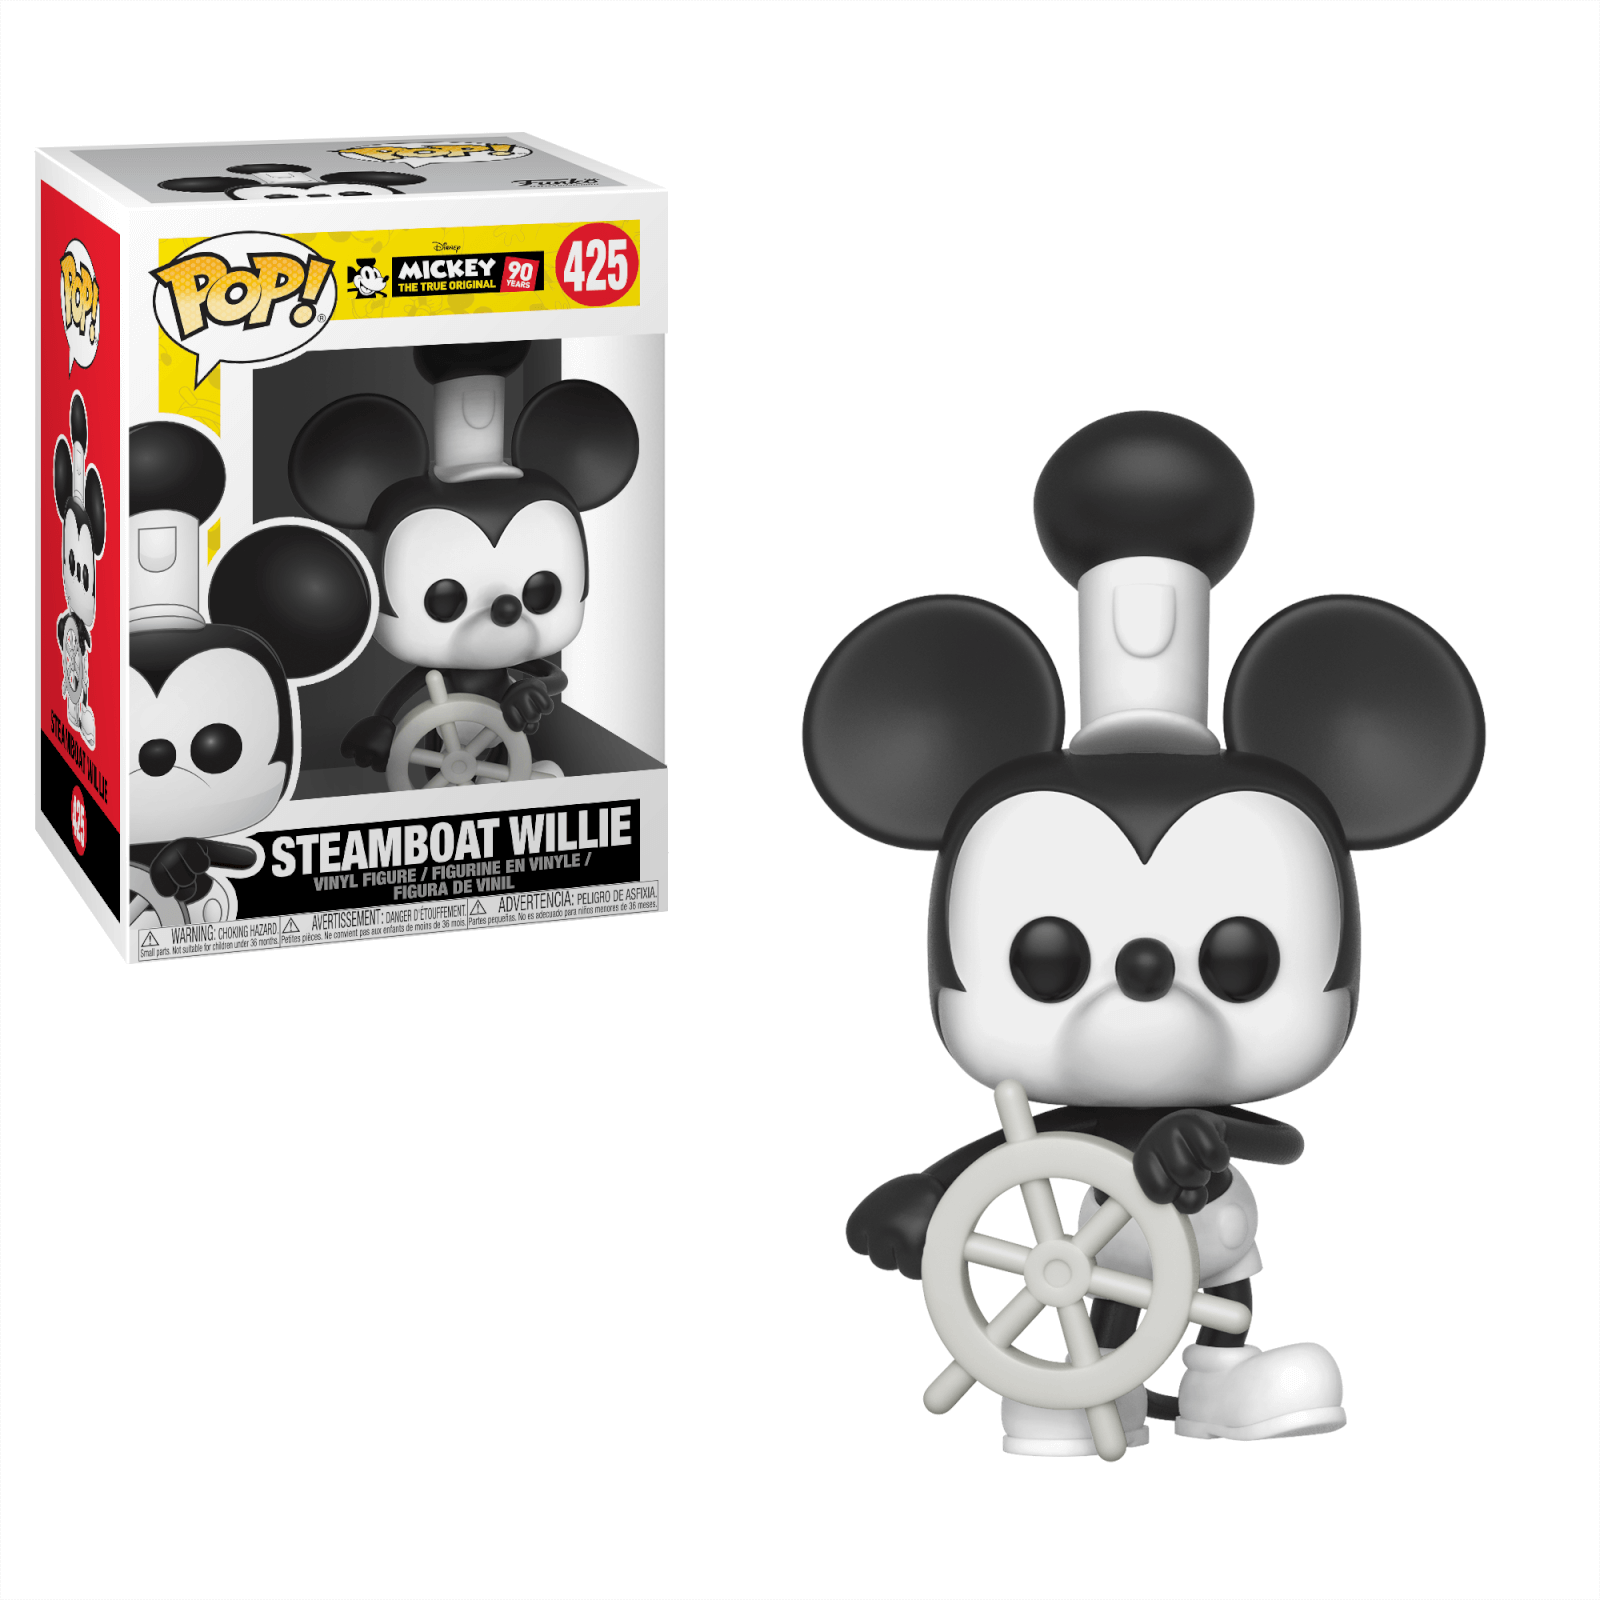 Steamboat Willie Disney Mickey/'s 90th Funko Pop